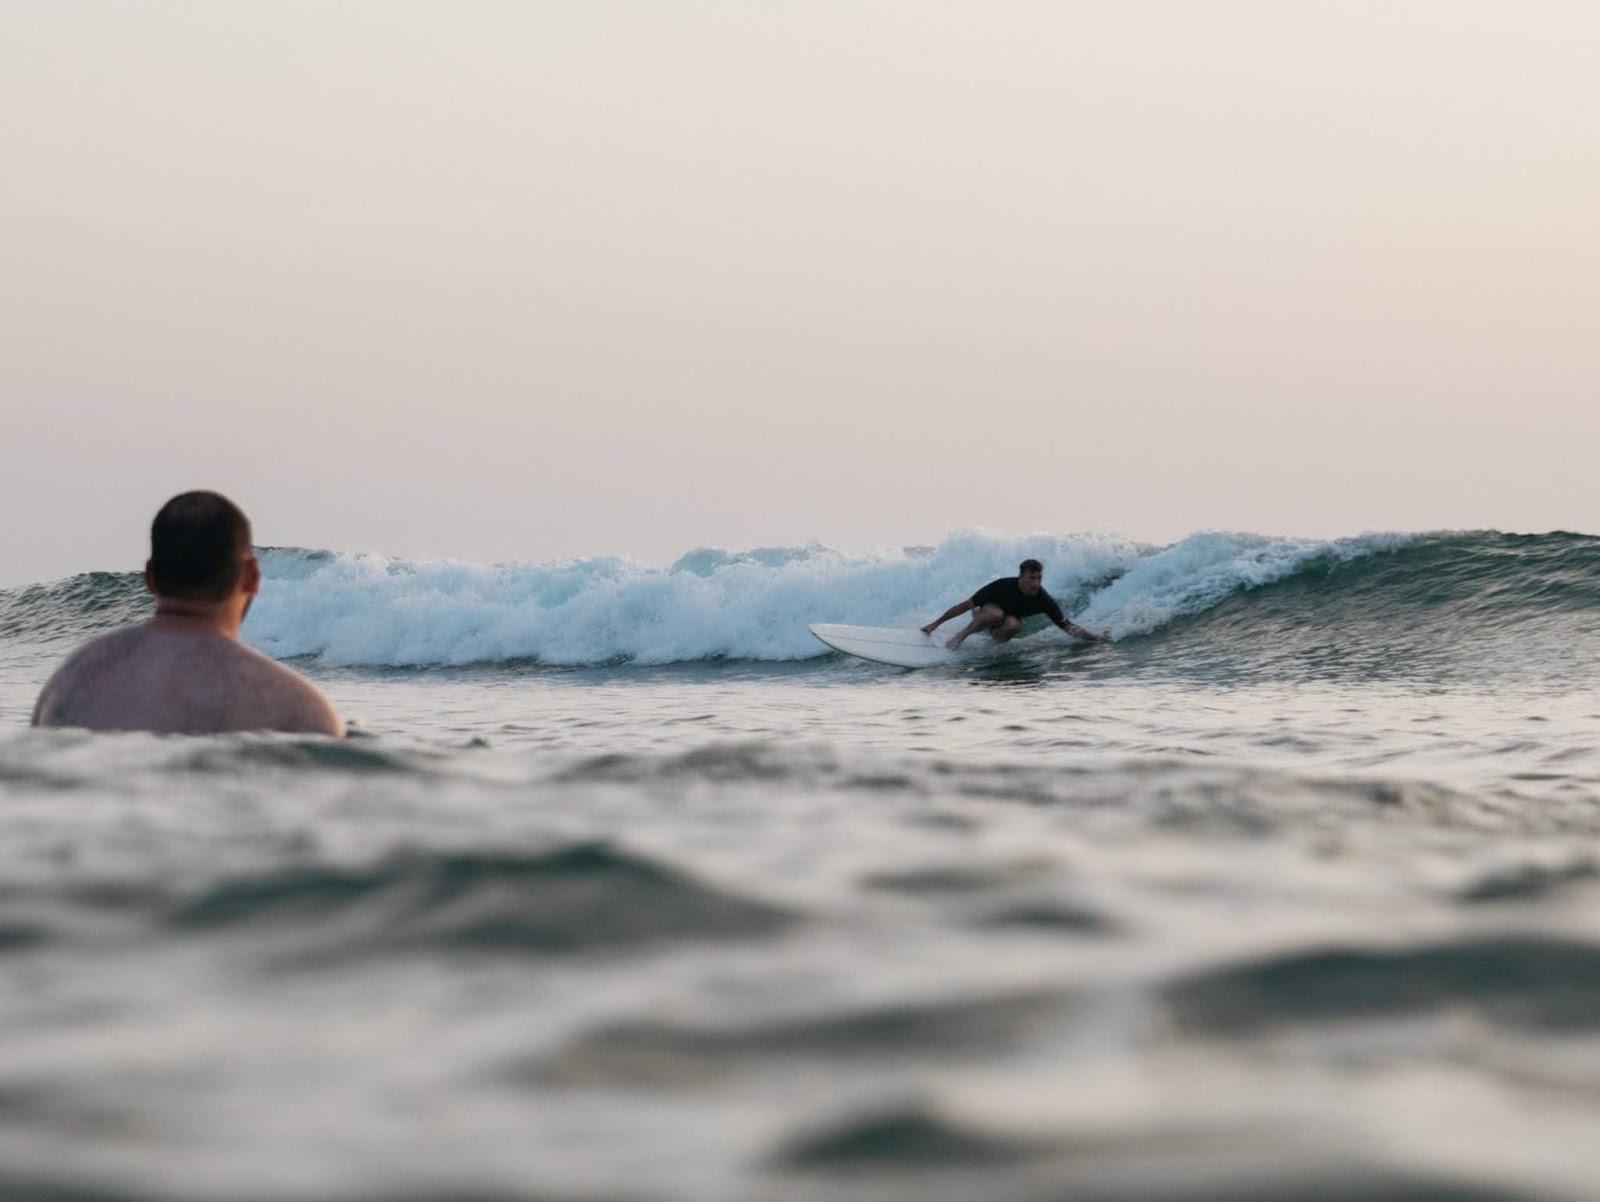 Vincent Lemanceau shaper and surfer in Hossegor -by Pierre David